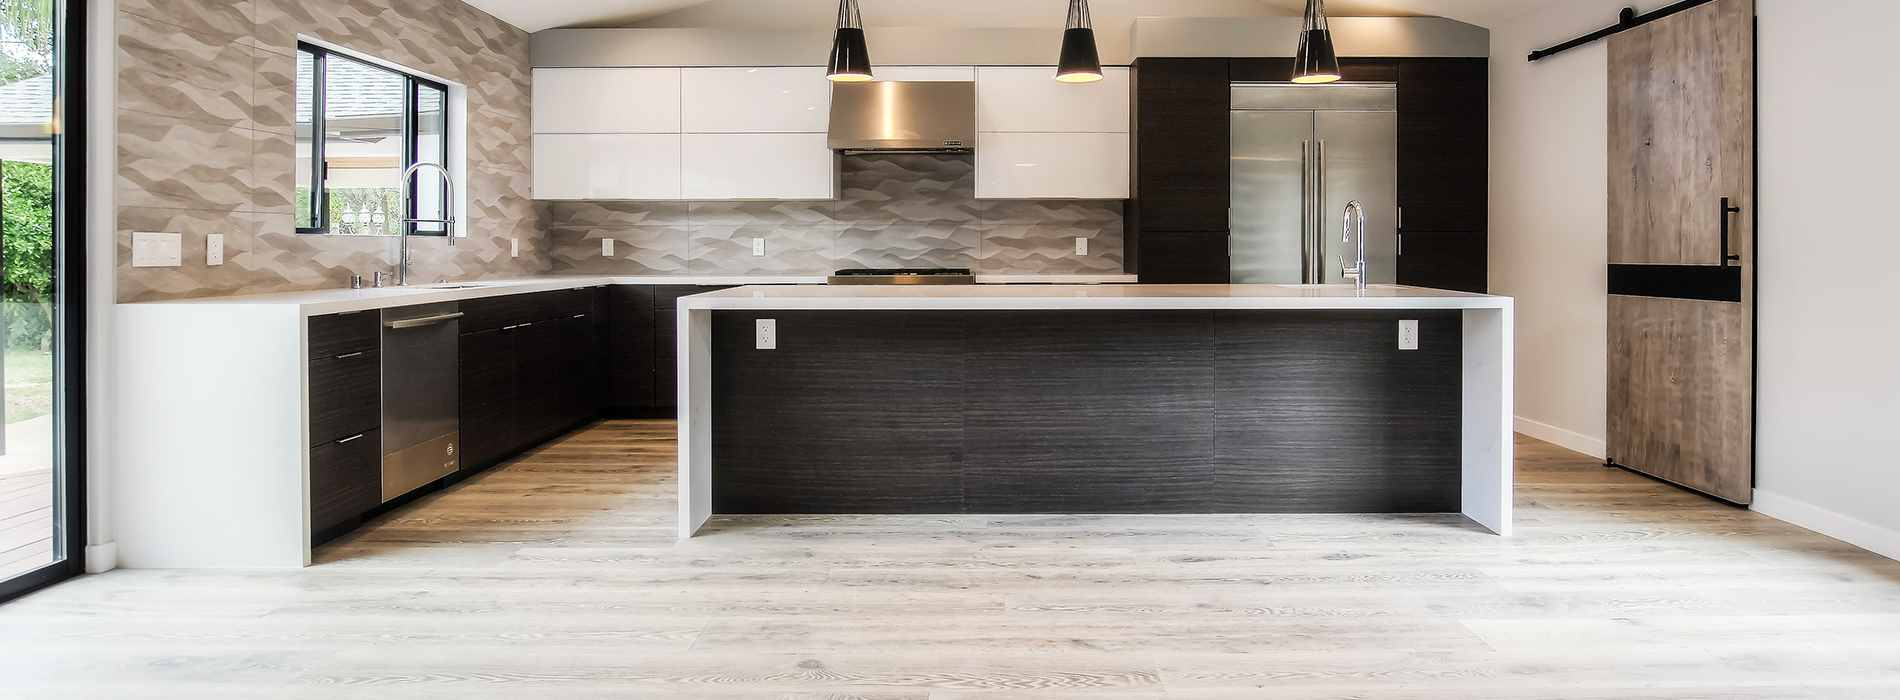 slider 1900x700 kitchen